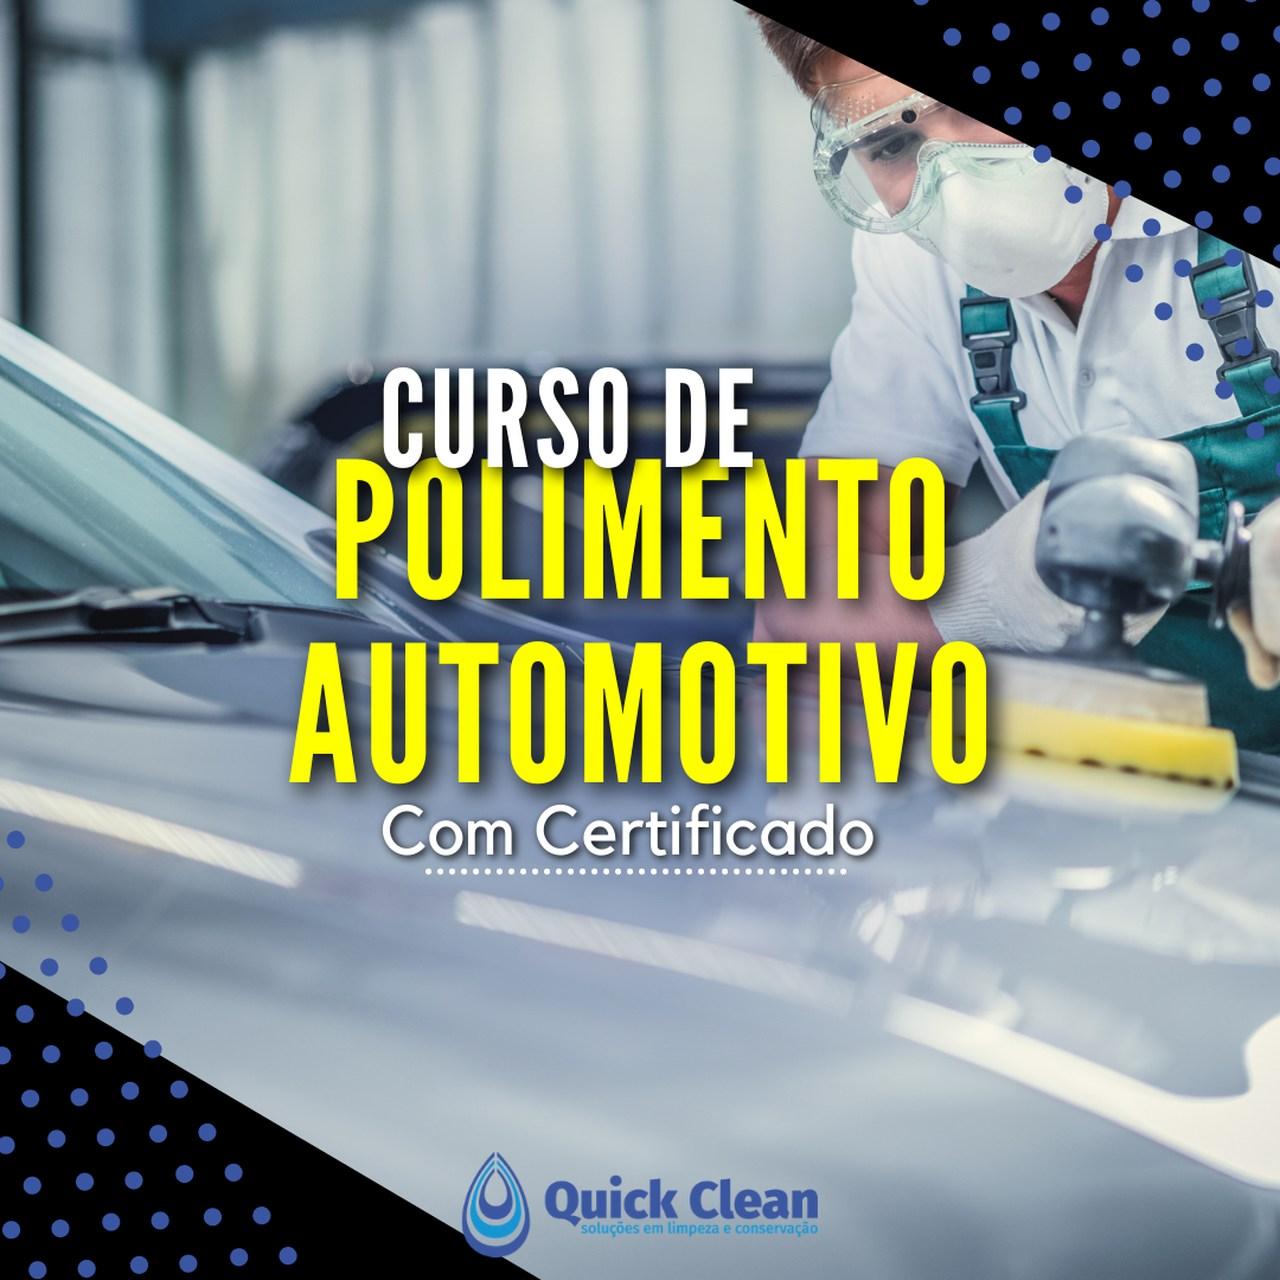 Curso de Polimento Automotivo